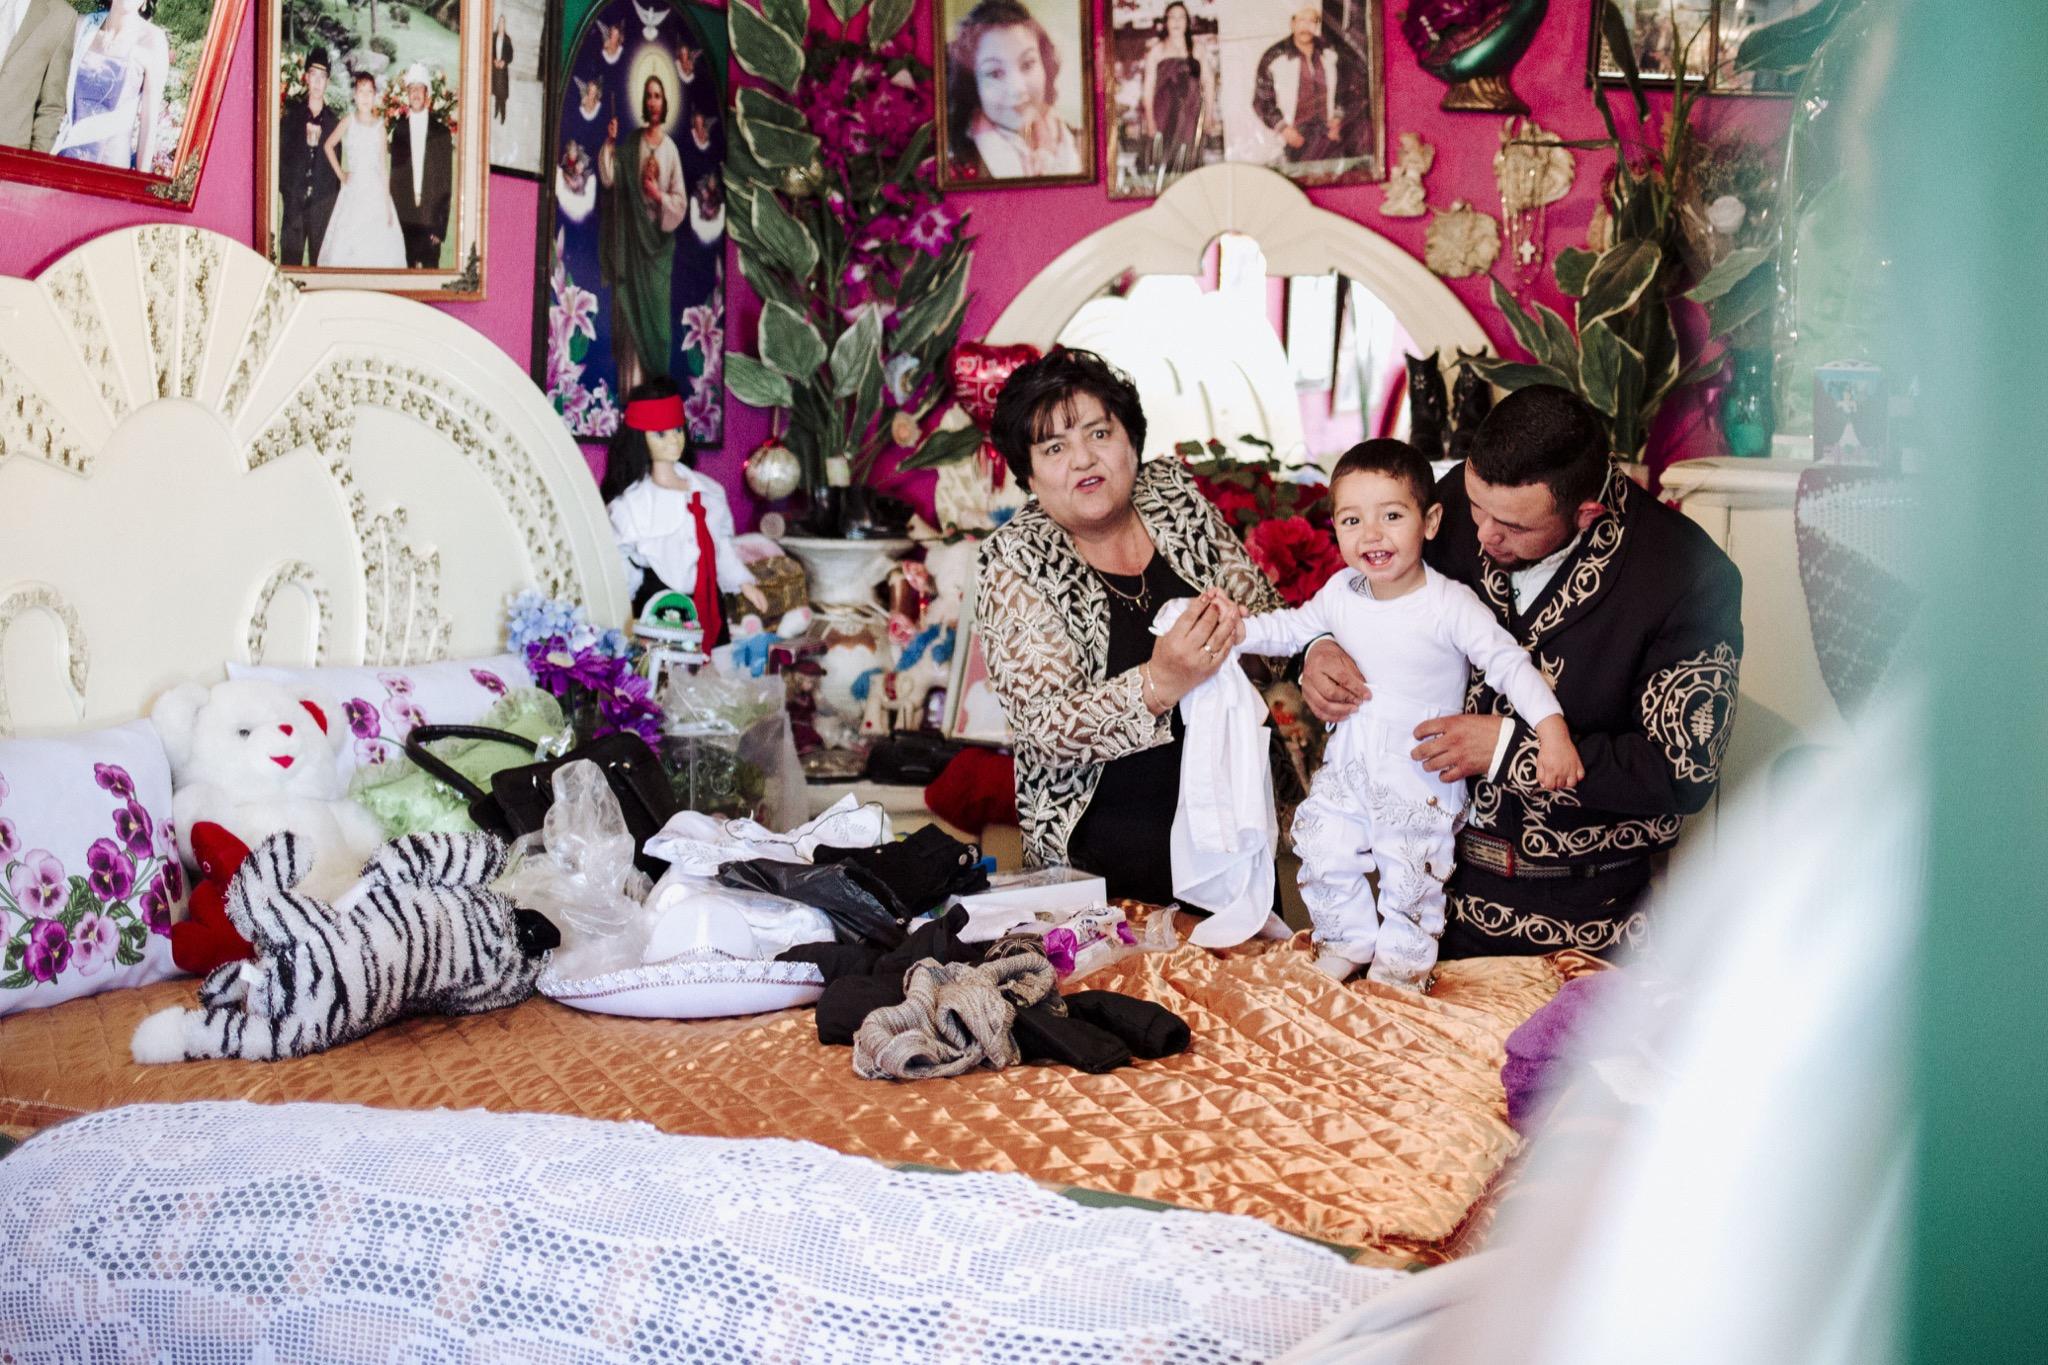 javier_noriega_fotografo_profesional_bodas_zacatecas_mexico_chihuahua_photographer_07